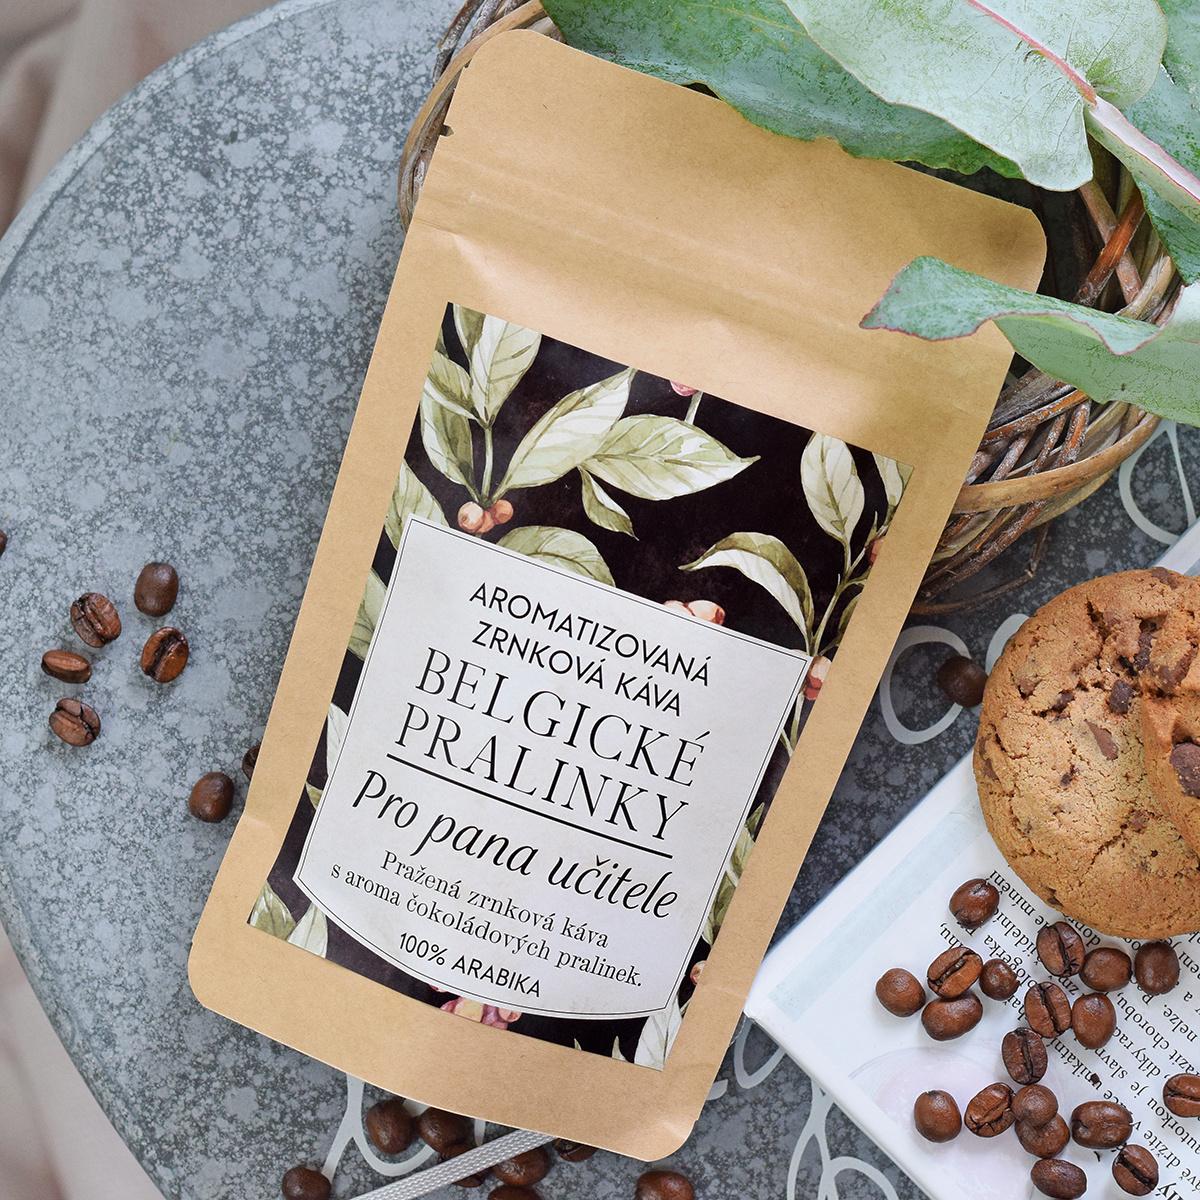 HOUSEDECOR Káva Belgické pralinky - pro pana učitele